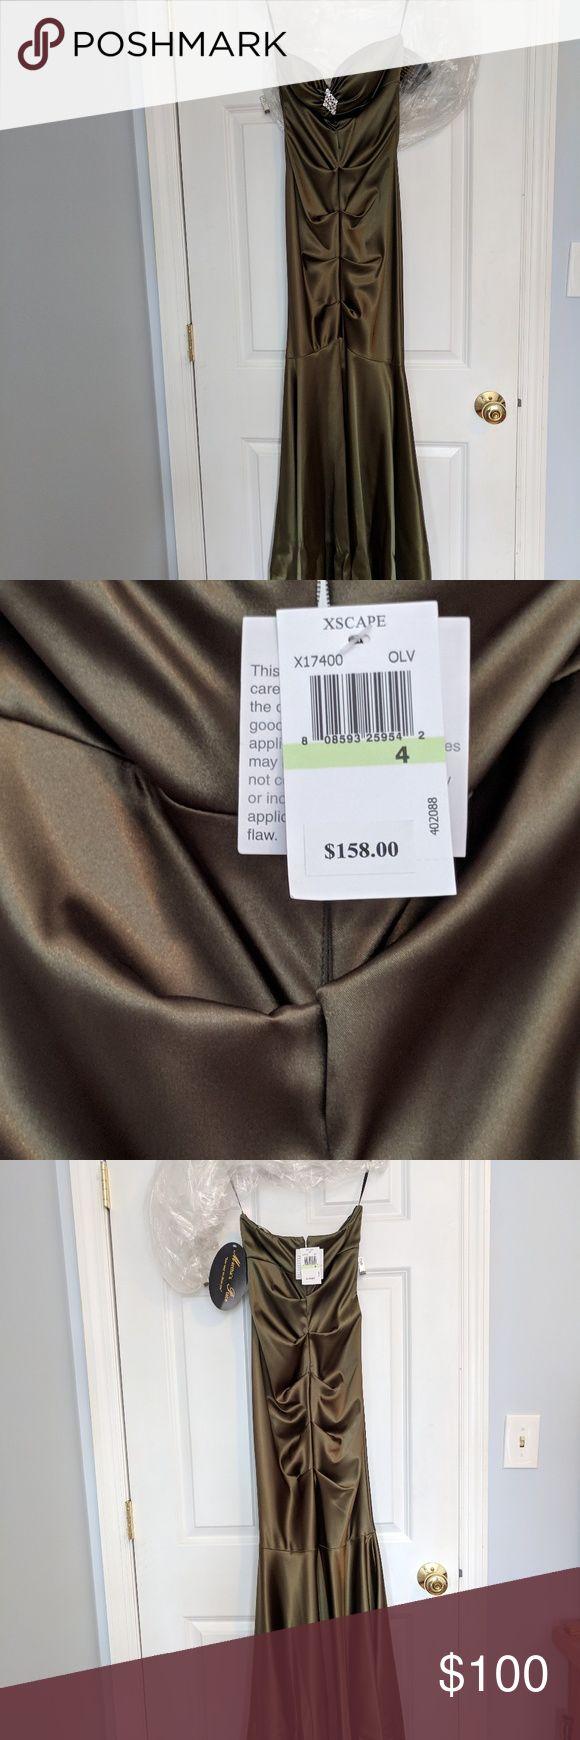 Never worn xscape olive prom dress. Size 4, olive Xscape prom dress. Brand new bought for $158. Xscape Dresses Prom